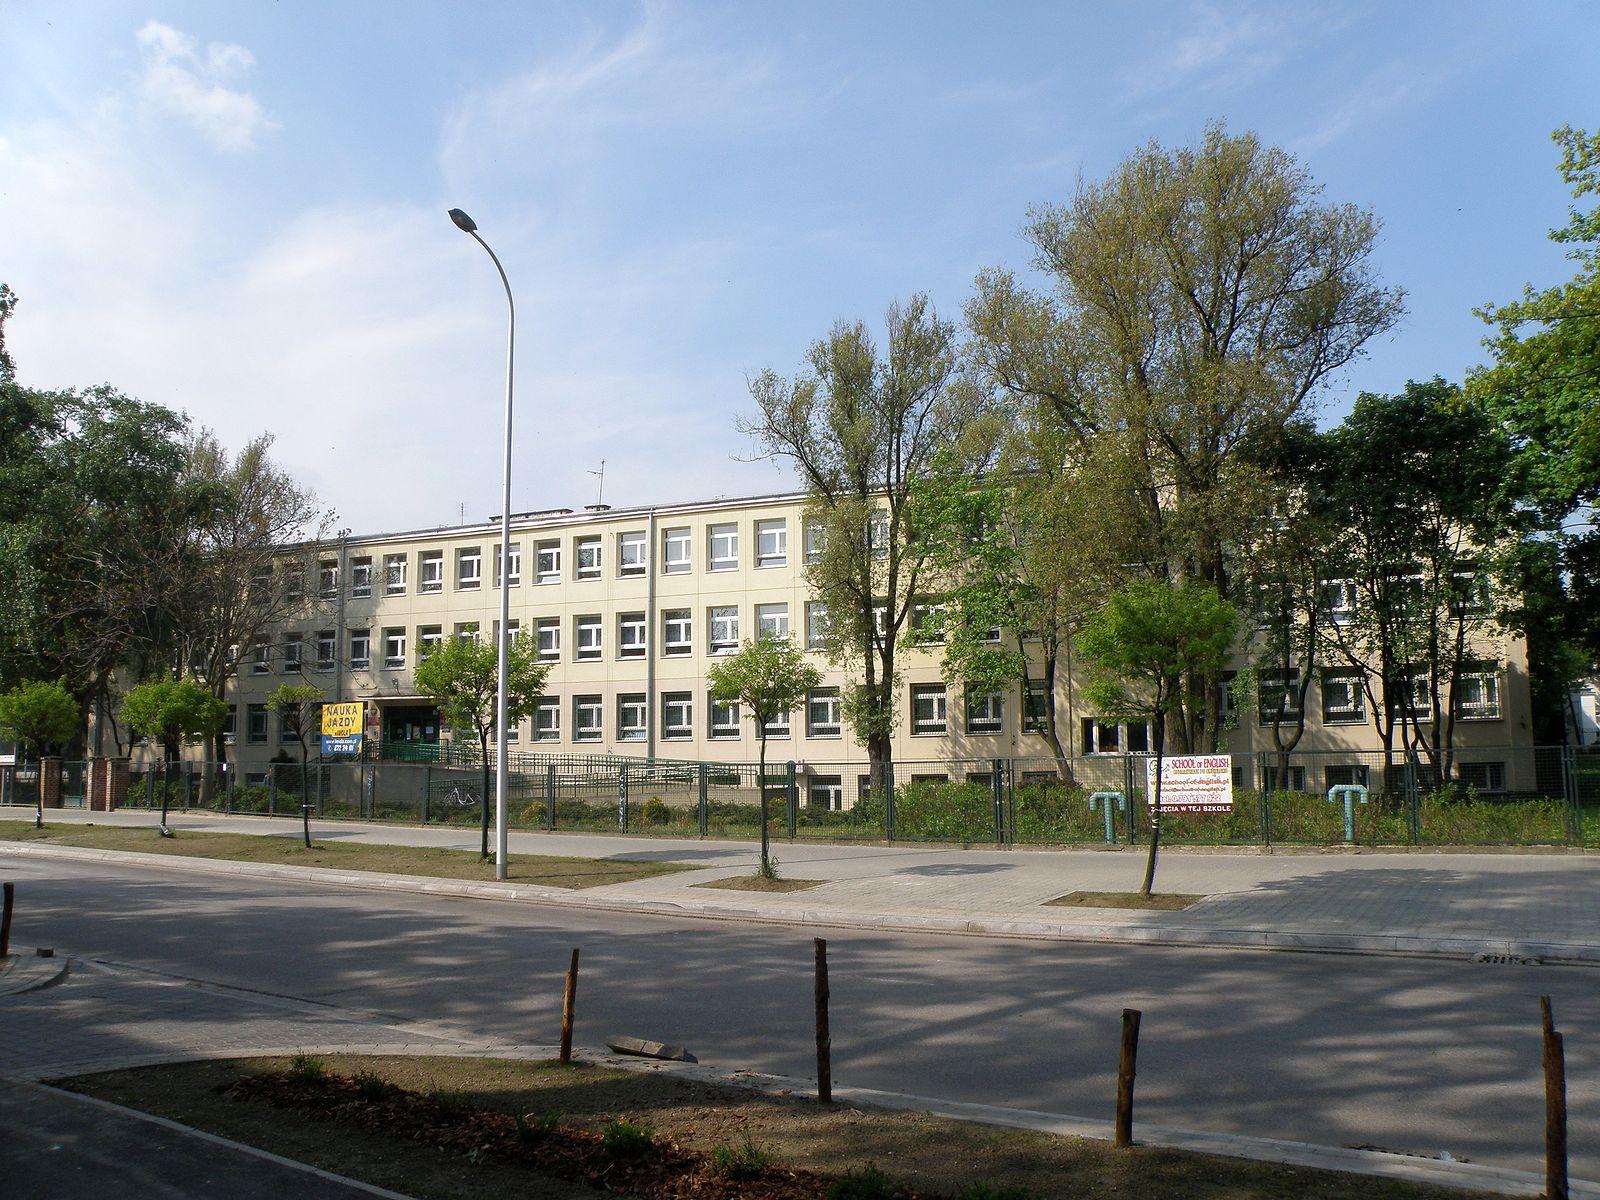 Gimnazjum Integracyjne nr 52